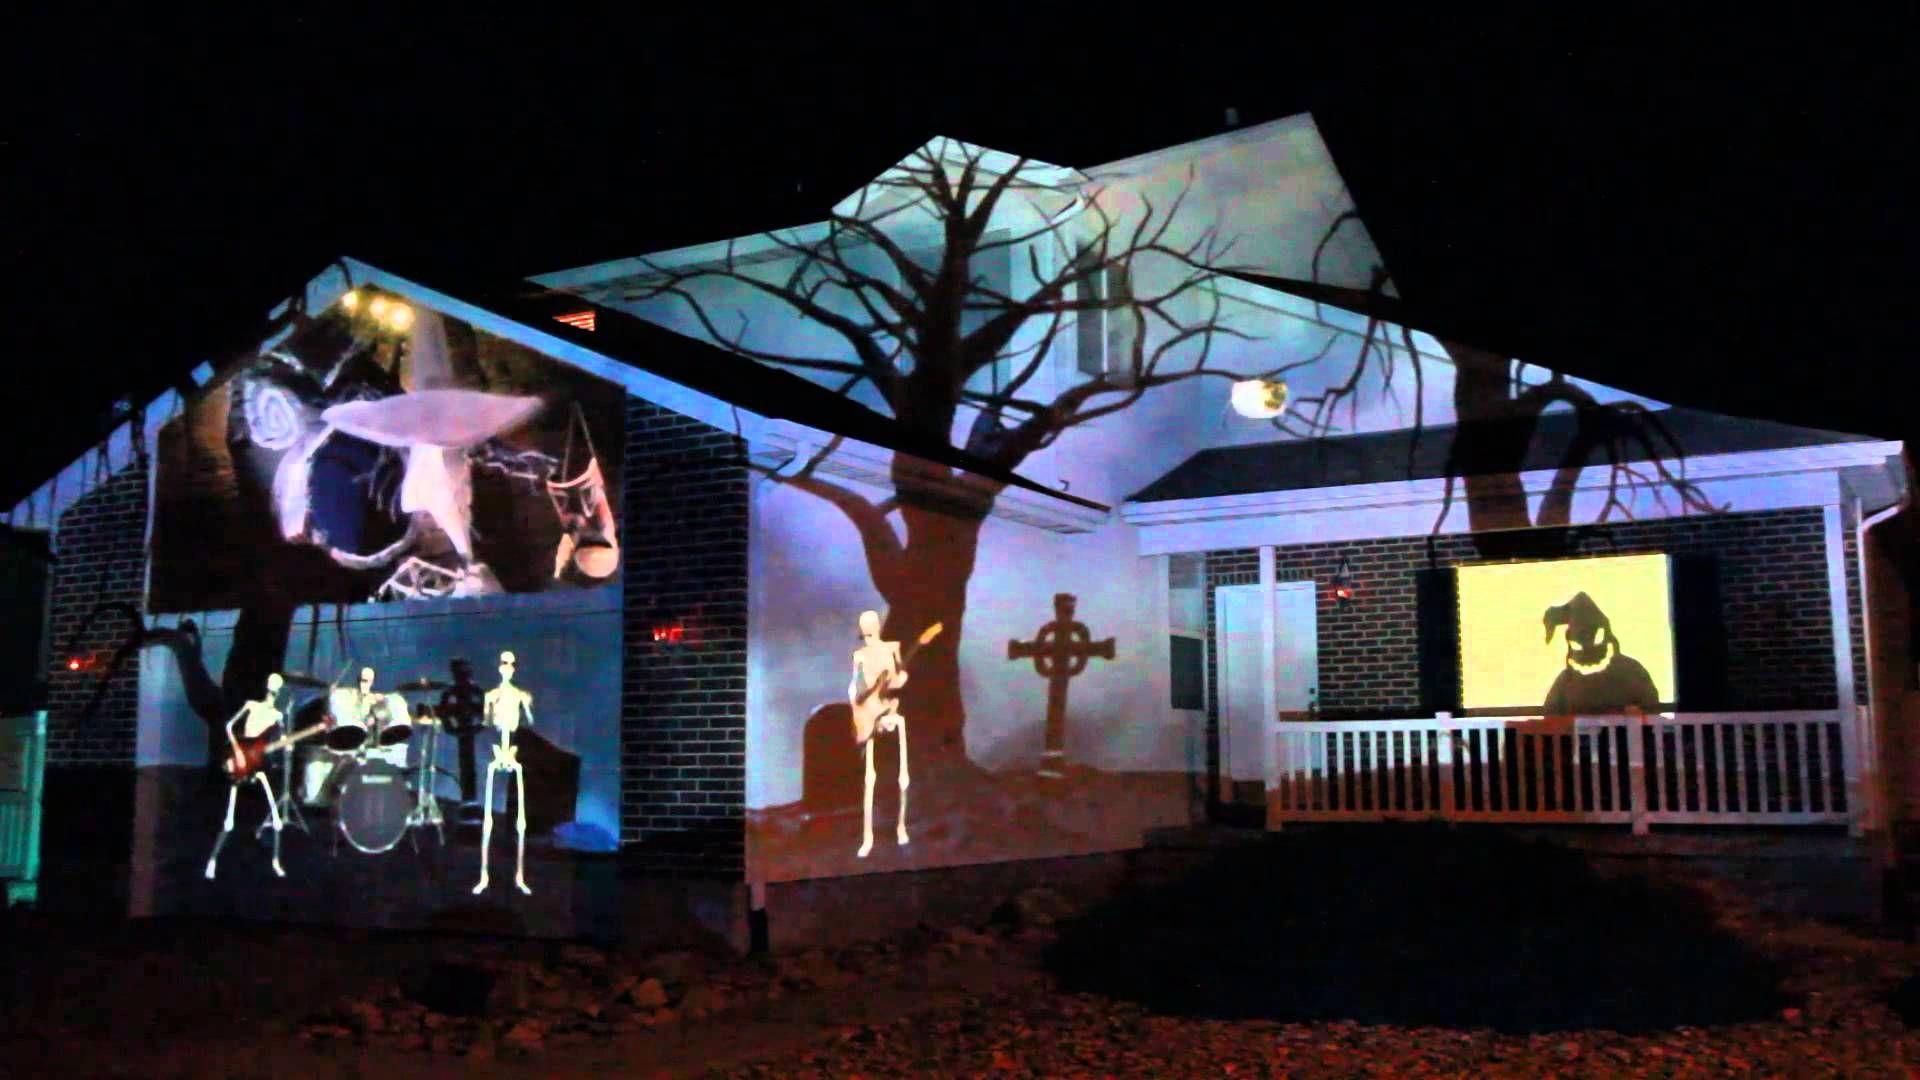 2015 Halloween House Projection Display Live Halloween